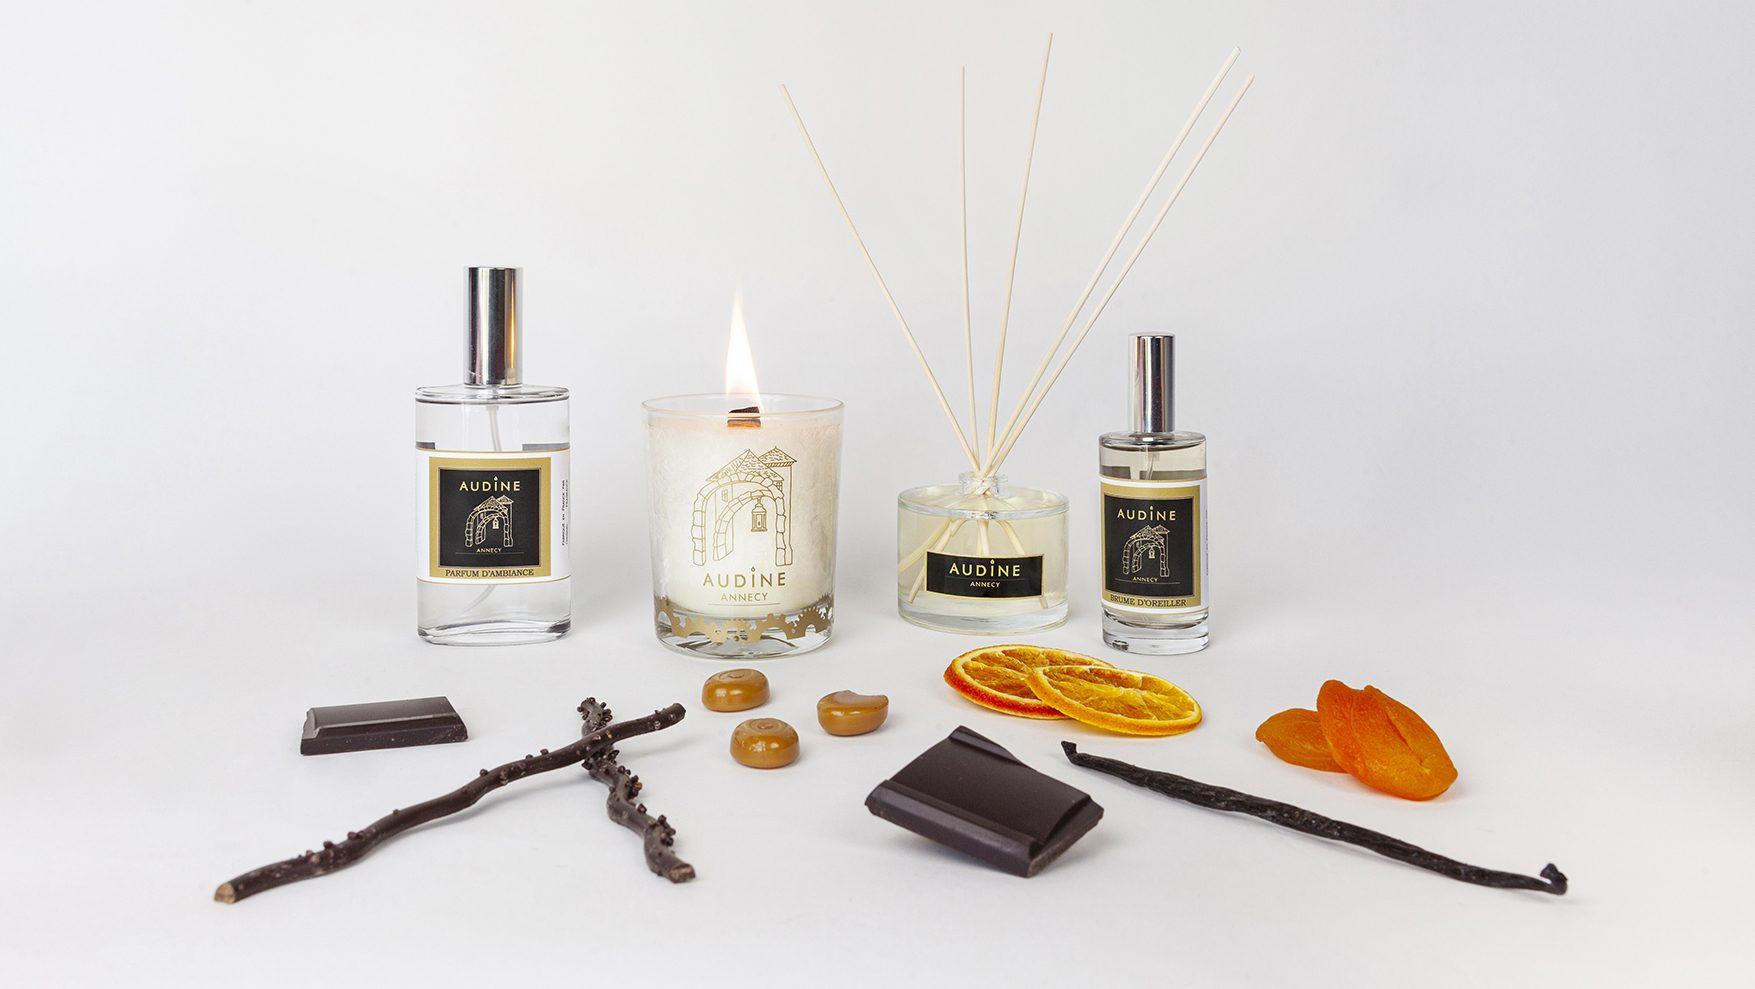 annecy audine bougie parfum ambiance